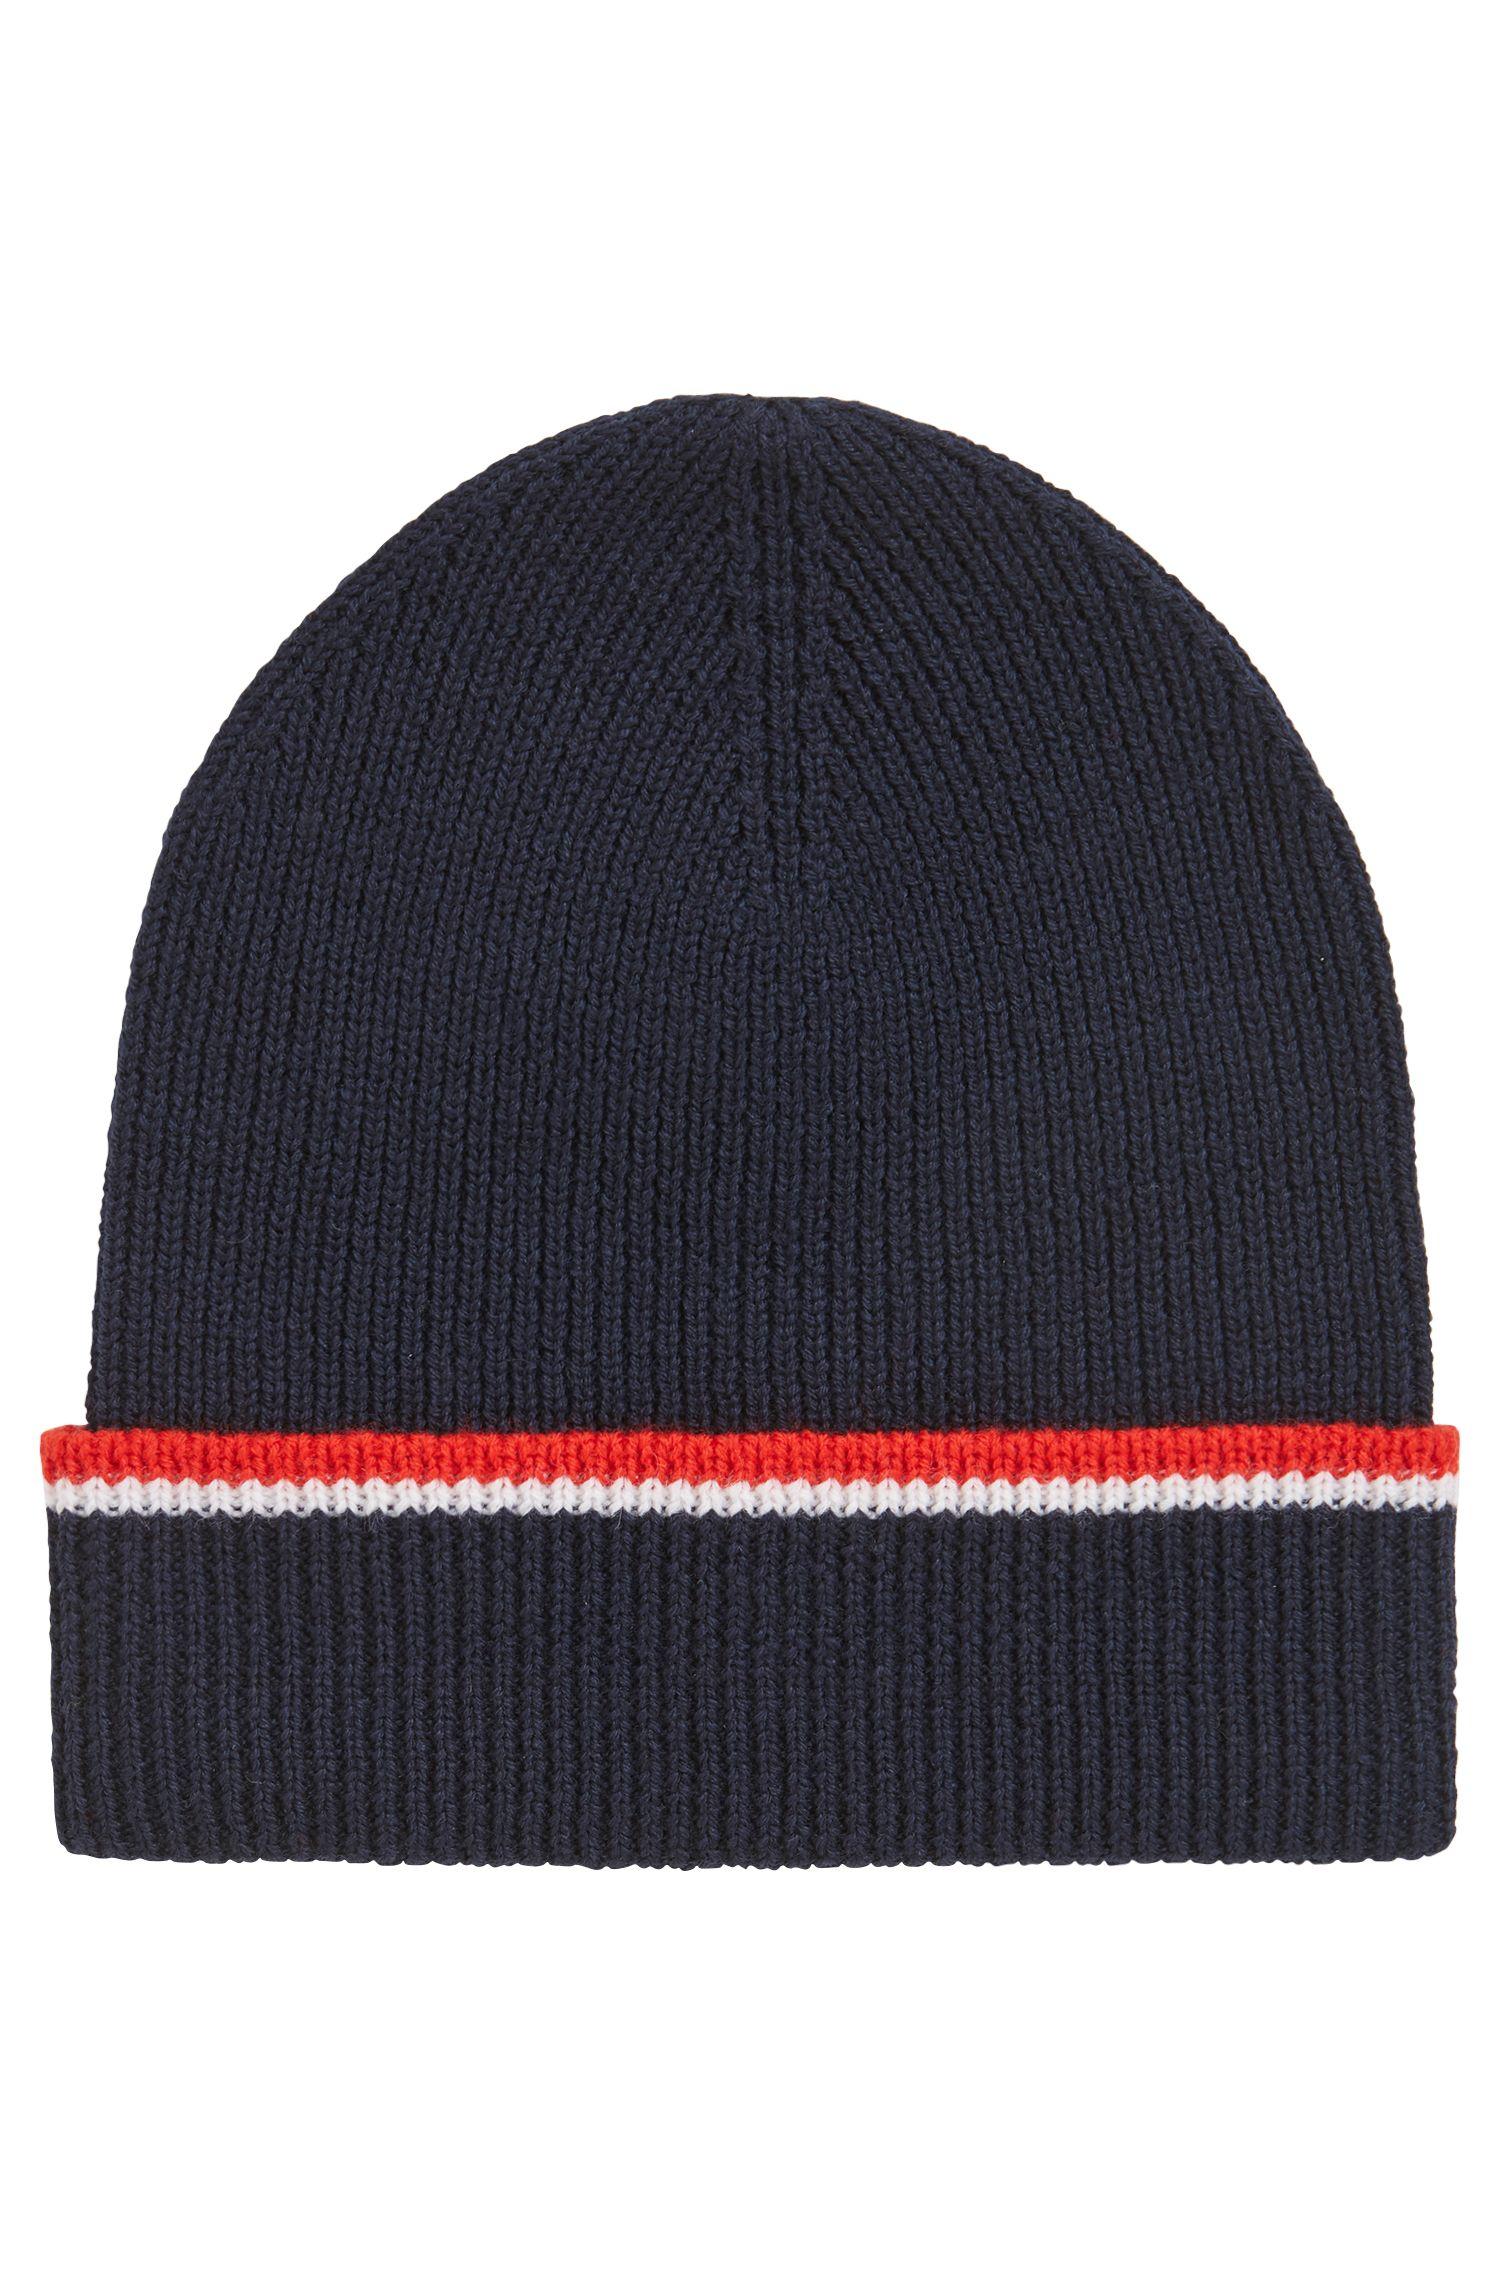 Limited-edition Paris Saint-Germain hat and scarf set, Dark Blue